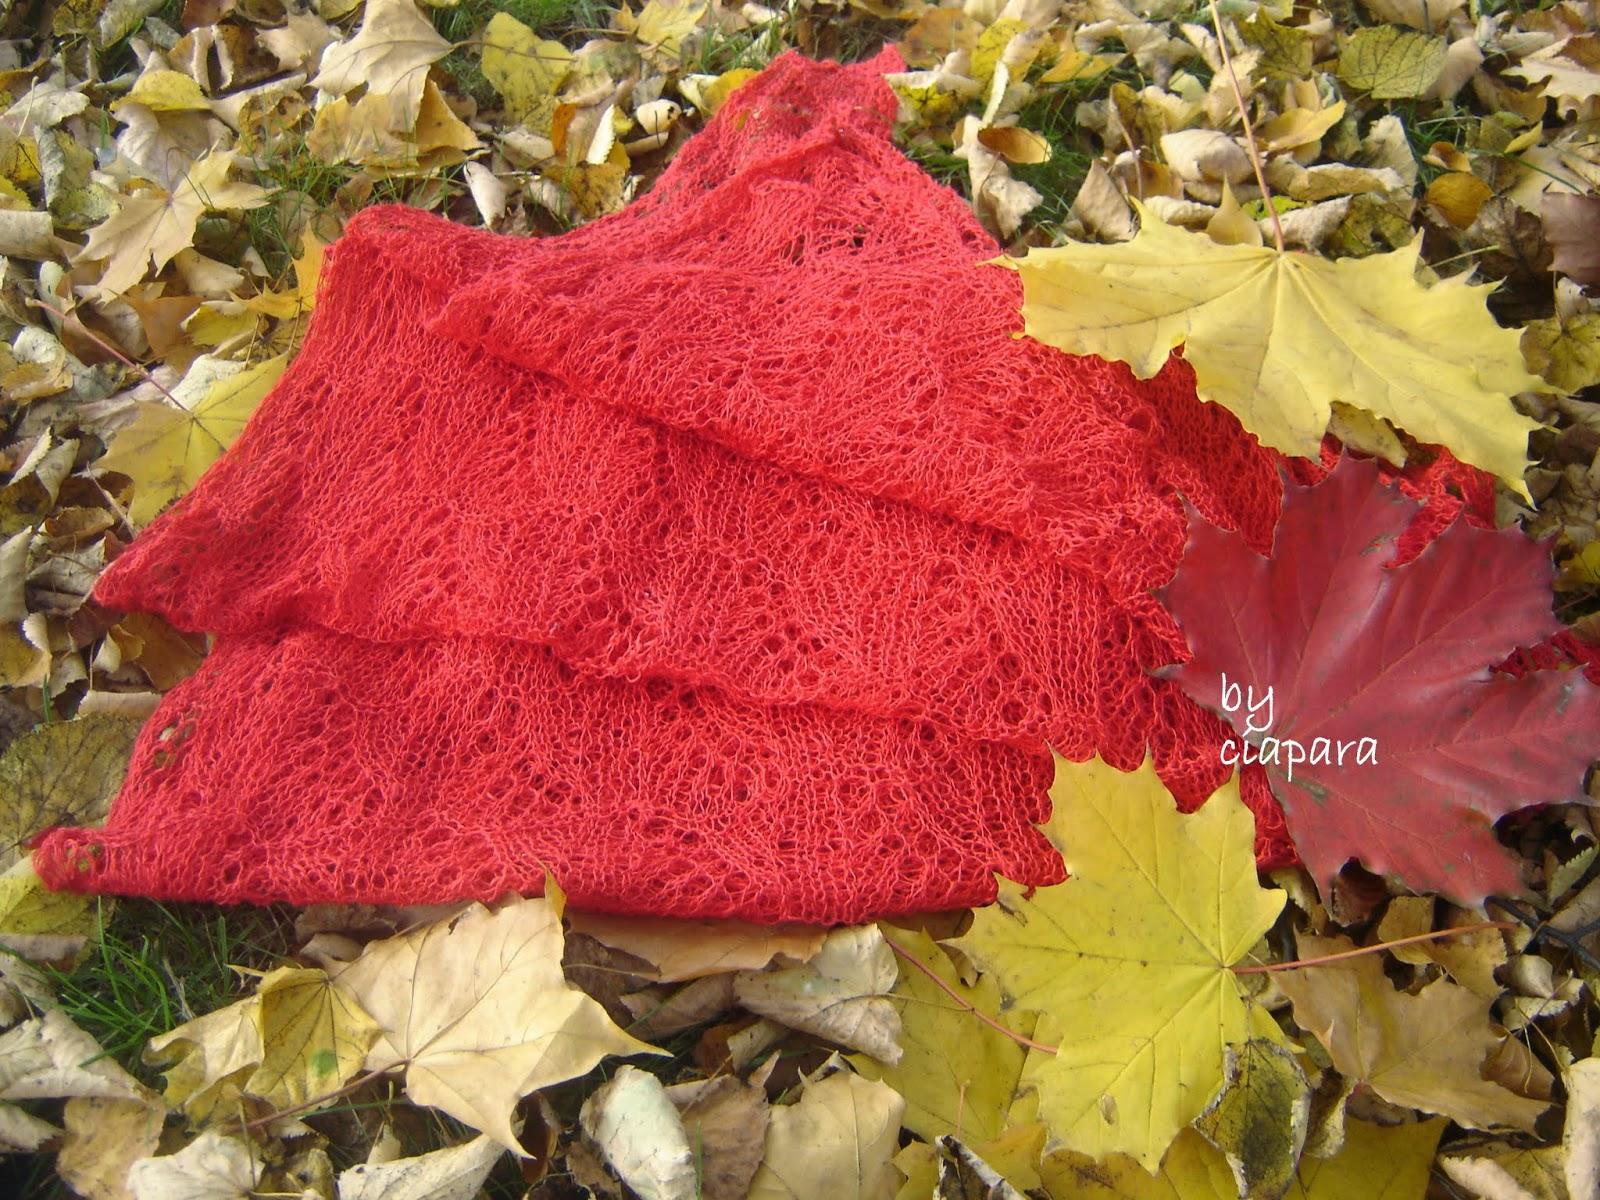 http://mojerobotkowanie.blogspot.com/2014/10/cobweb-in-shawls-lace.html